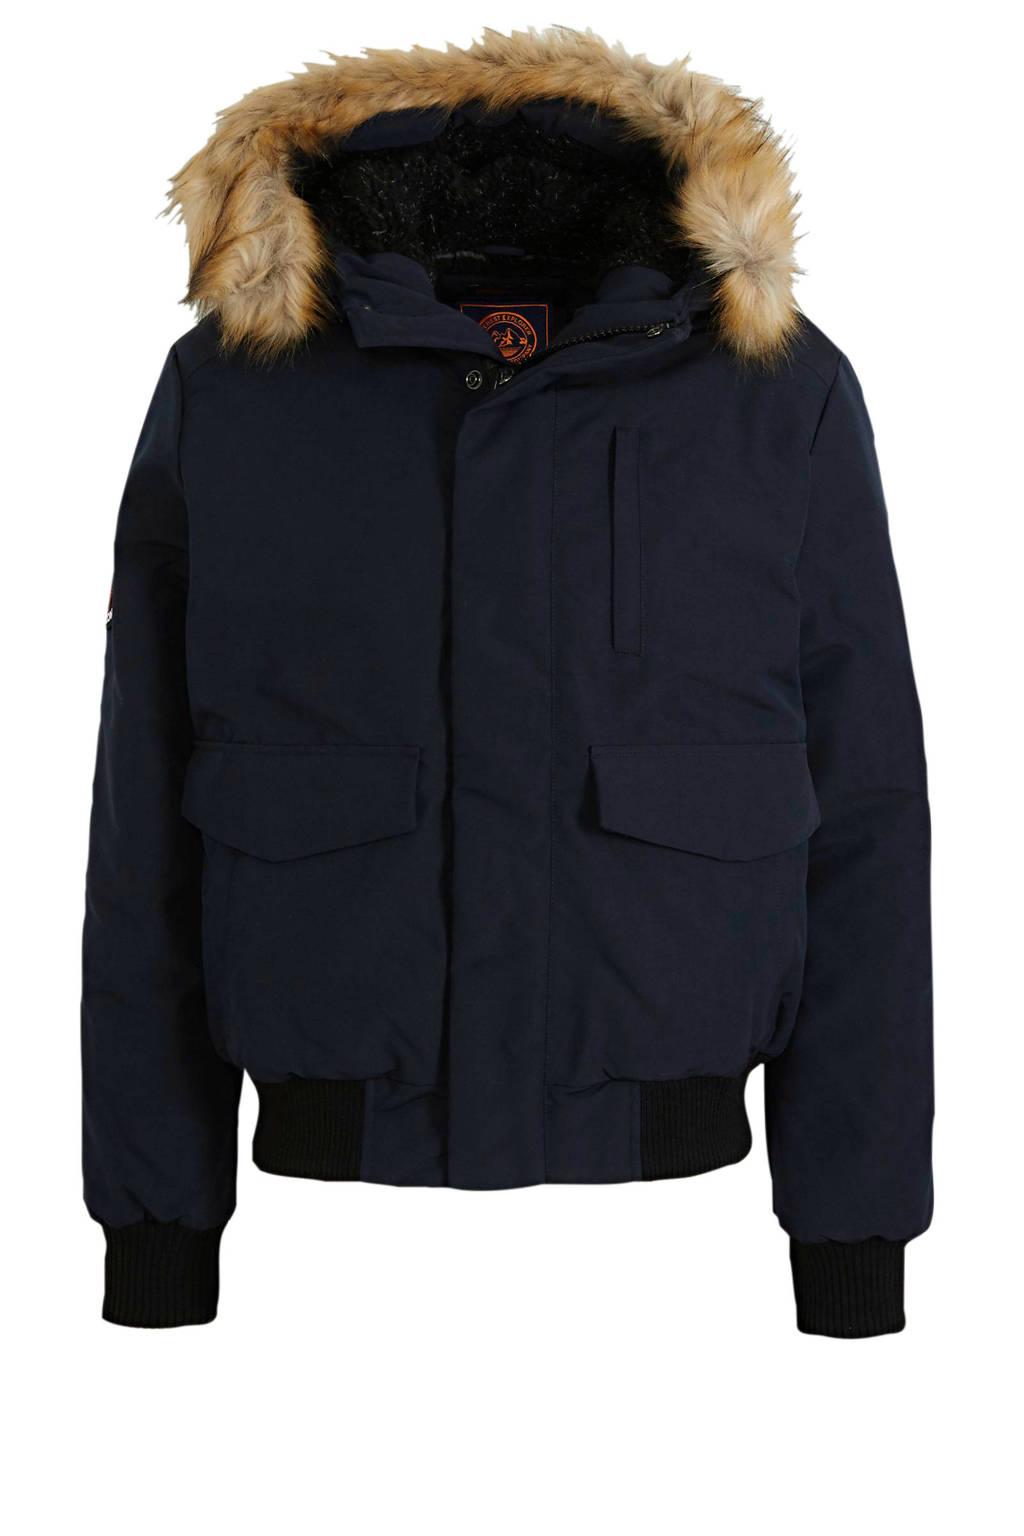 Superdry jas donkerblauw, Donkerblauw